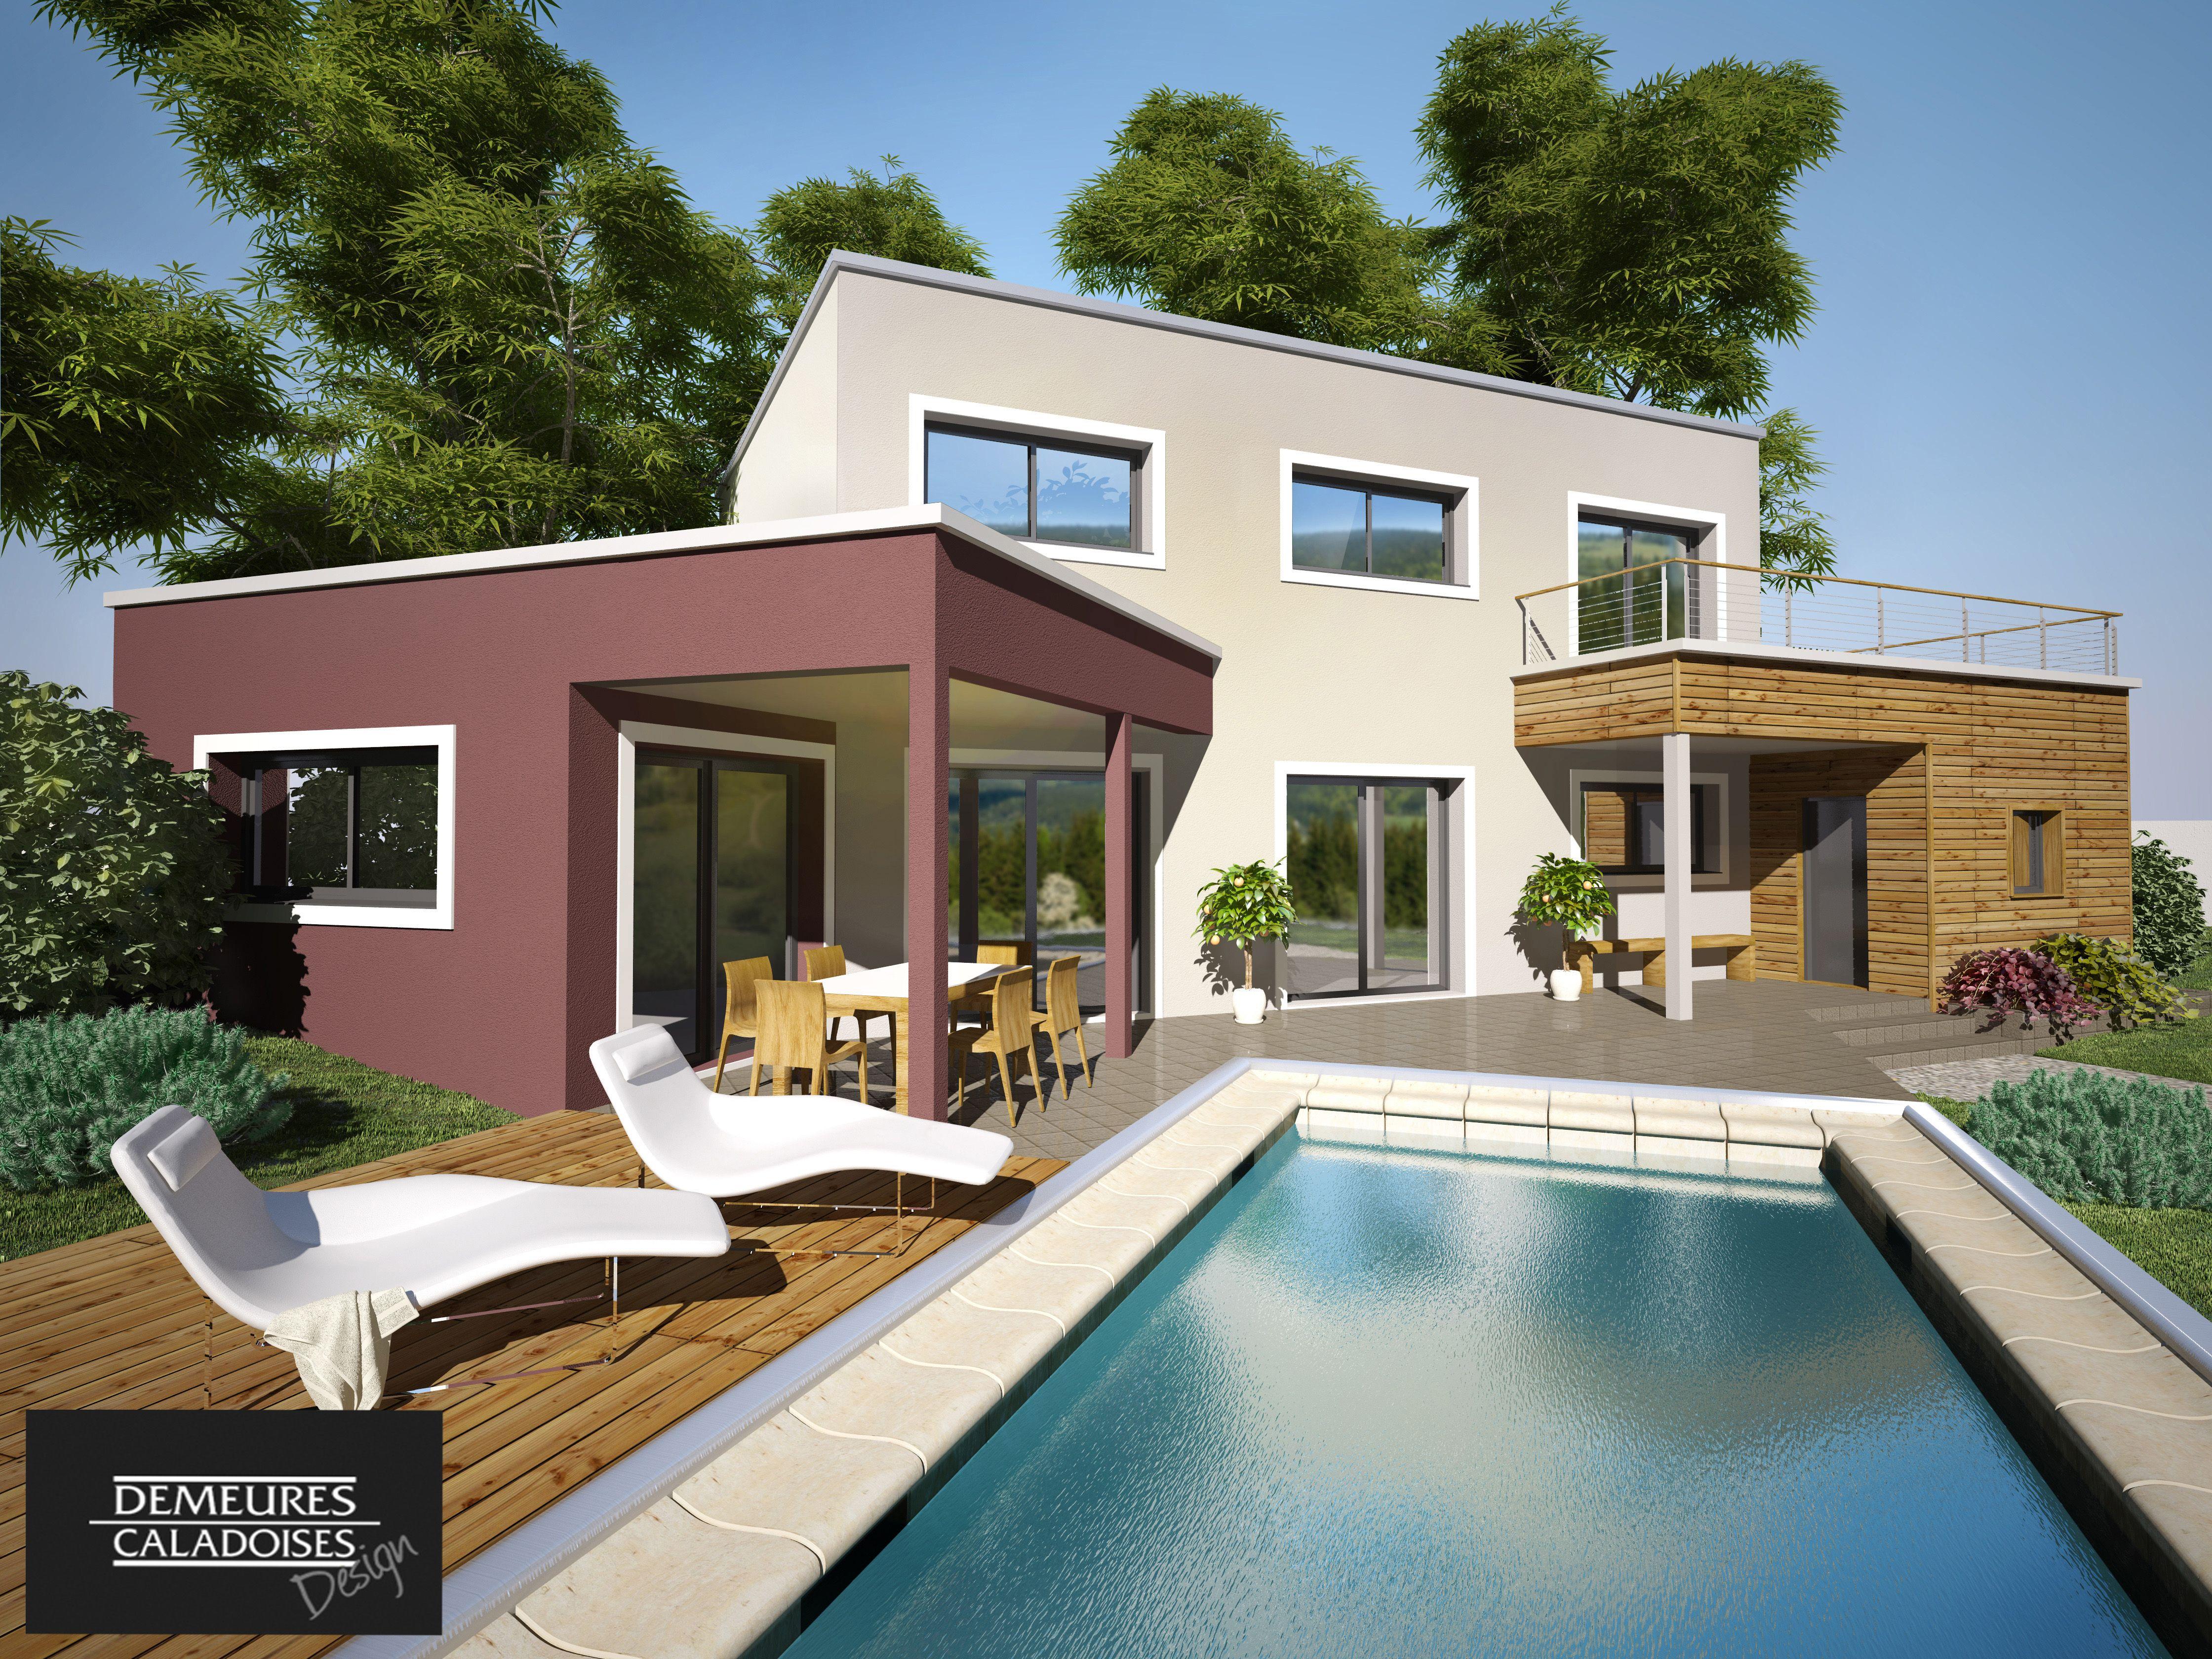 MANILLE #construction #villa #demeure #design #etage #moderne ...